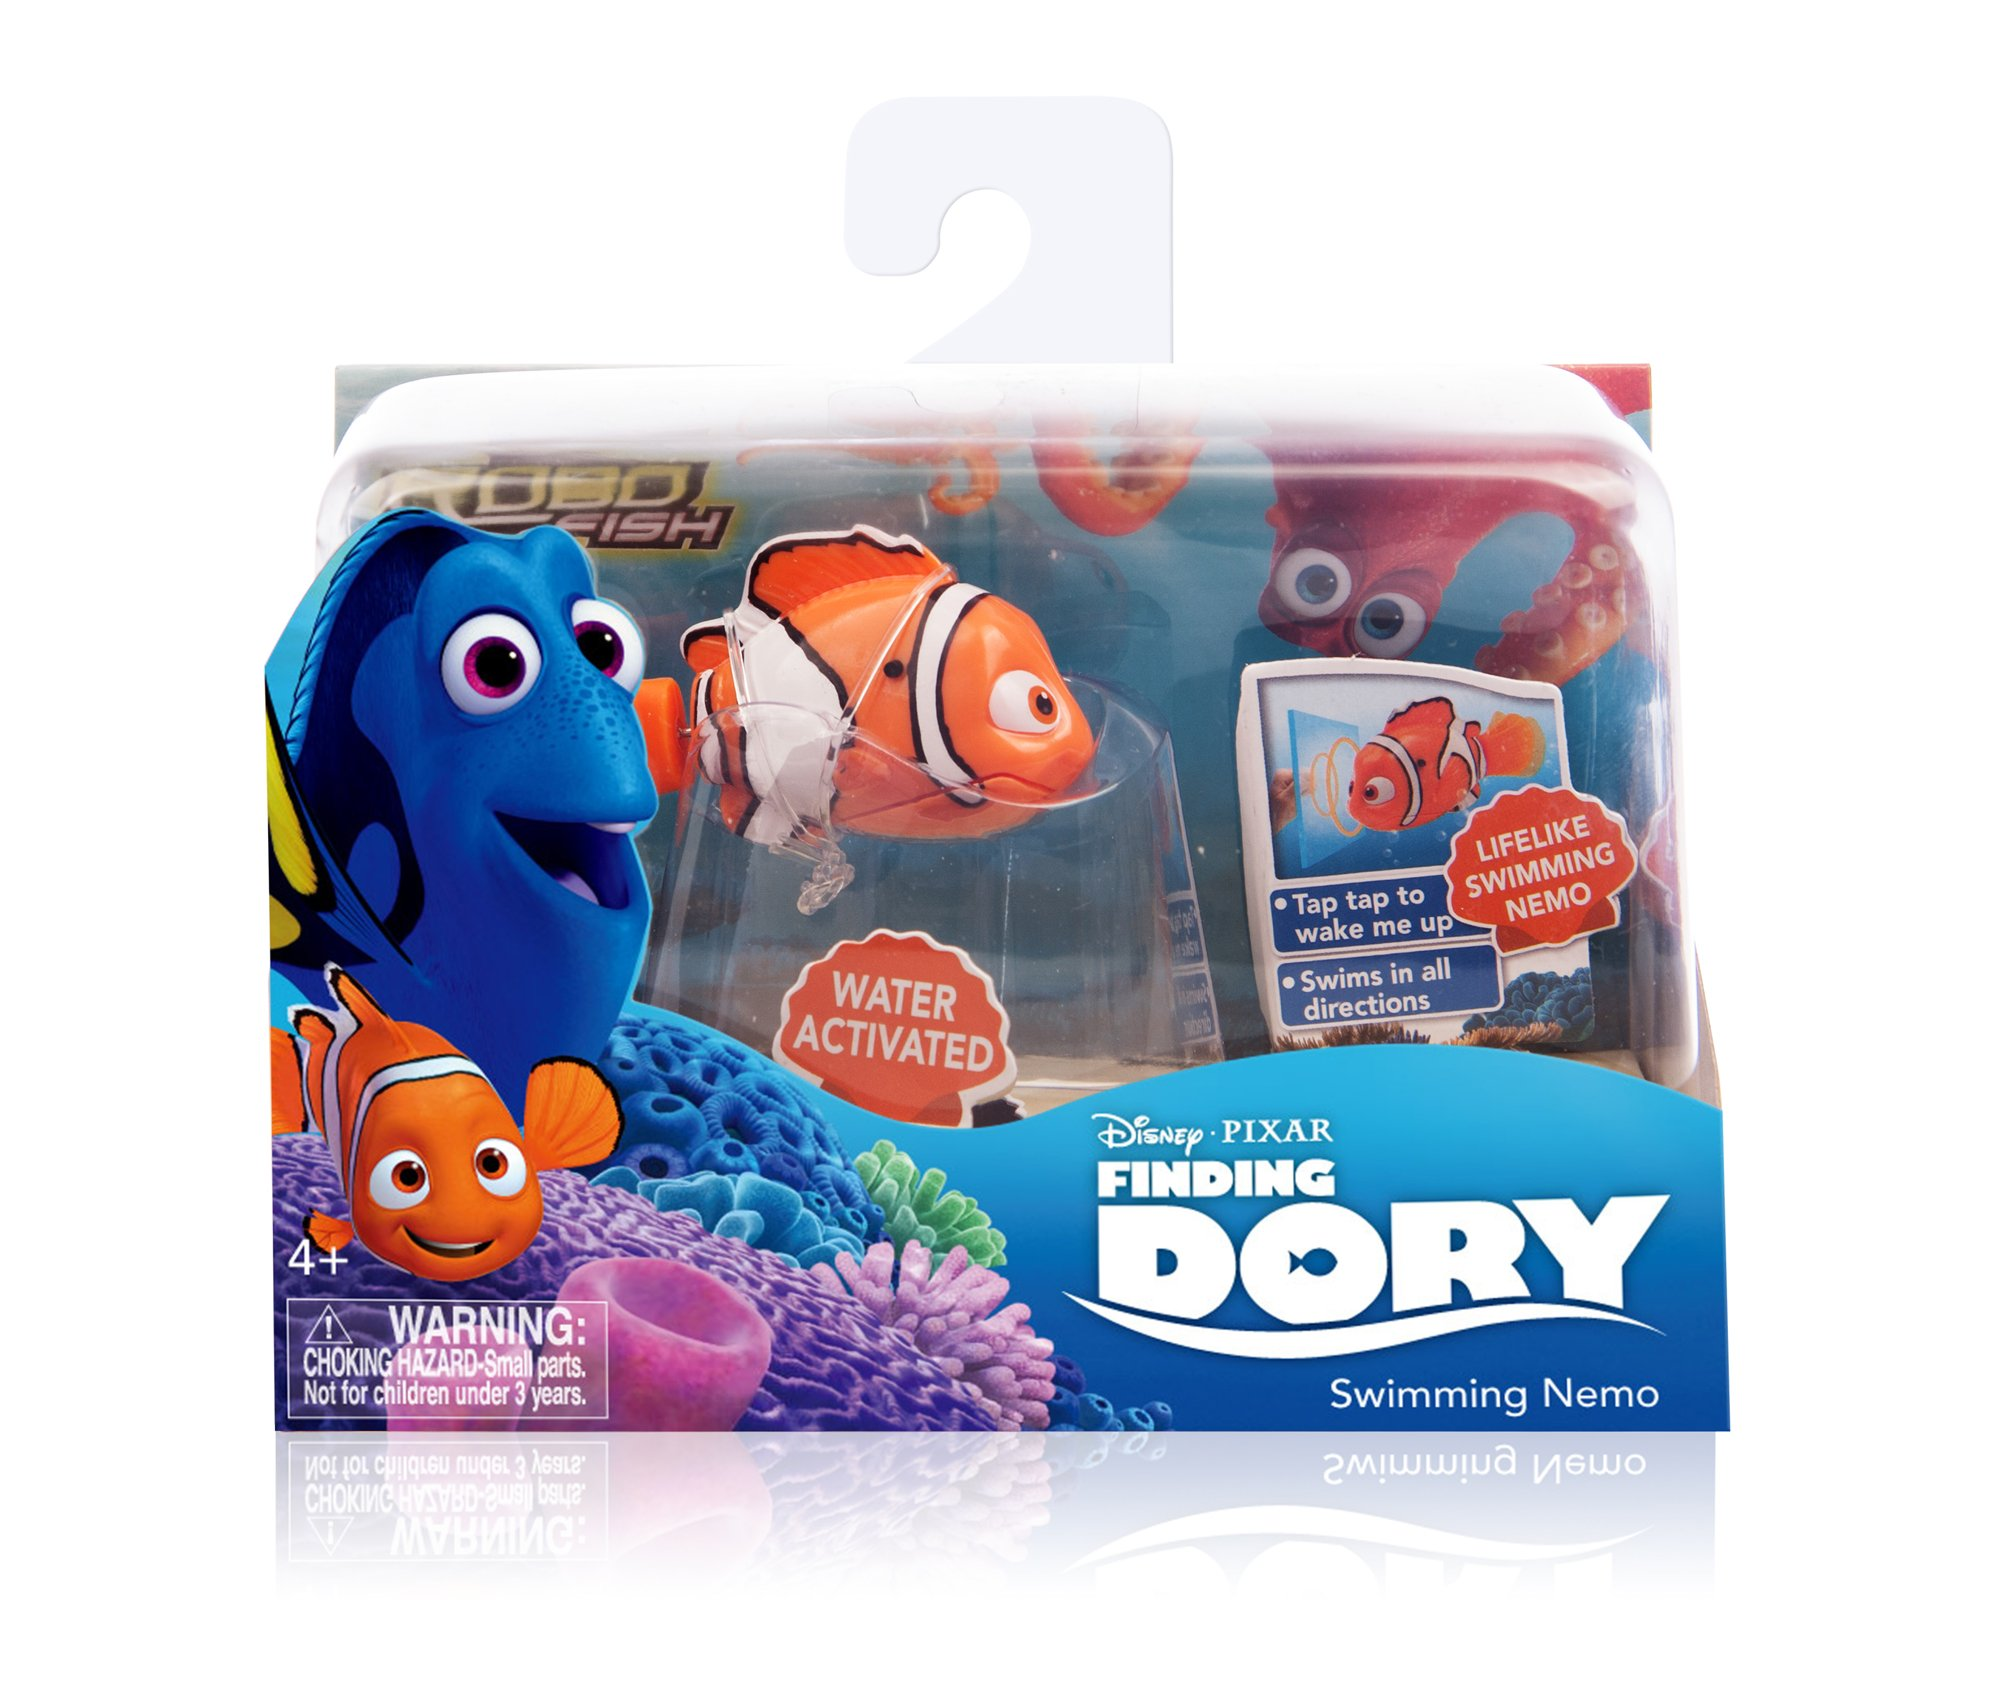 Zuru 22783 ''Finding Dory Robo Fish'' Playset